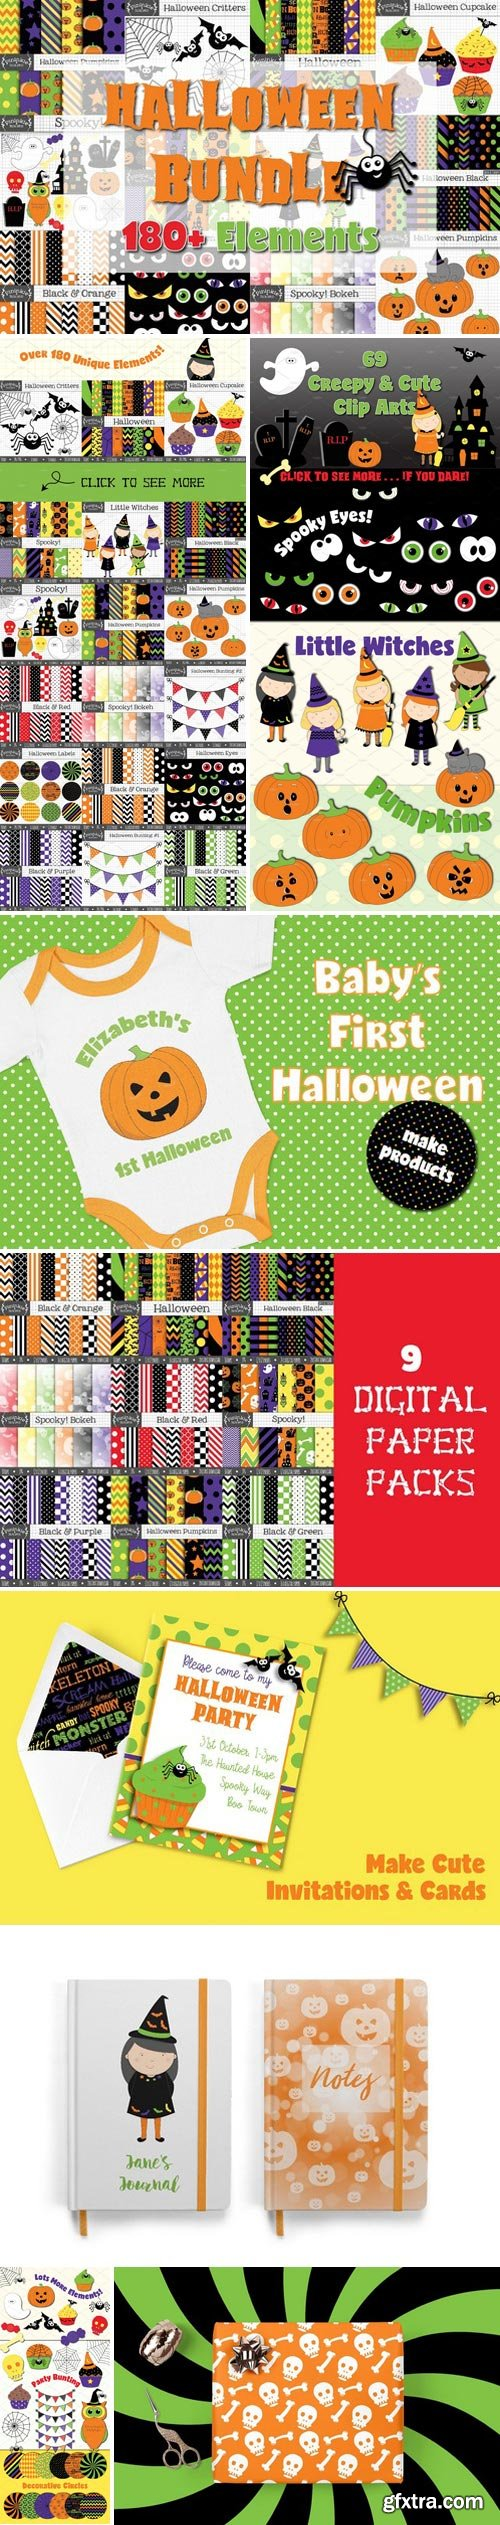 CM - Halloween Graphics Bundle 2779000